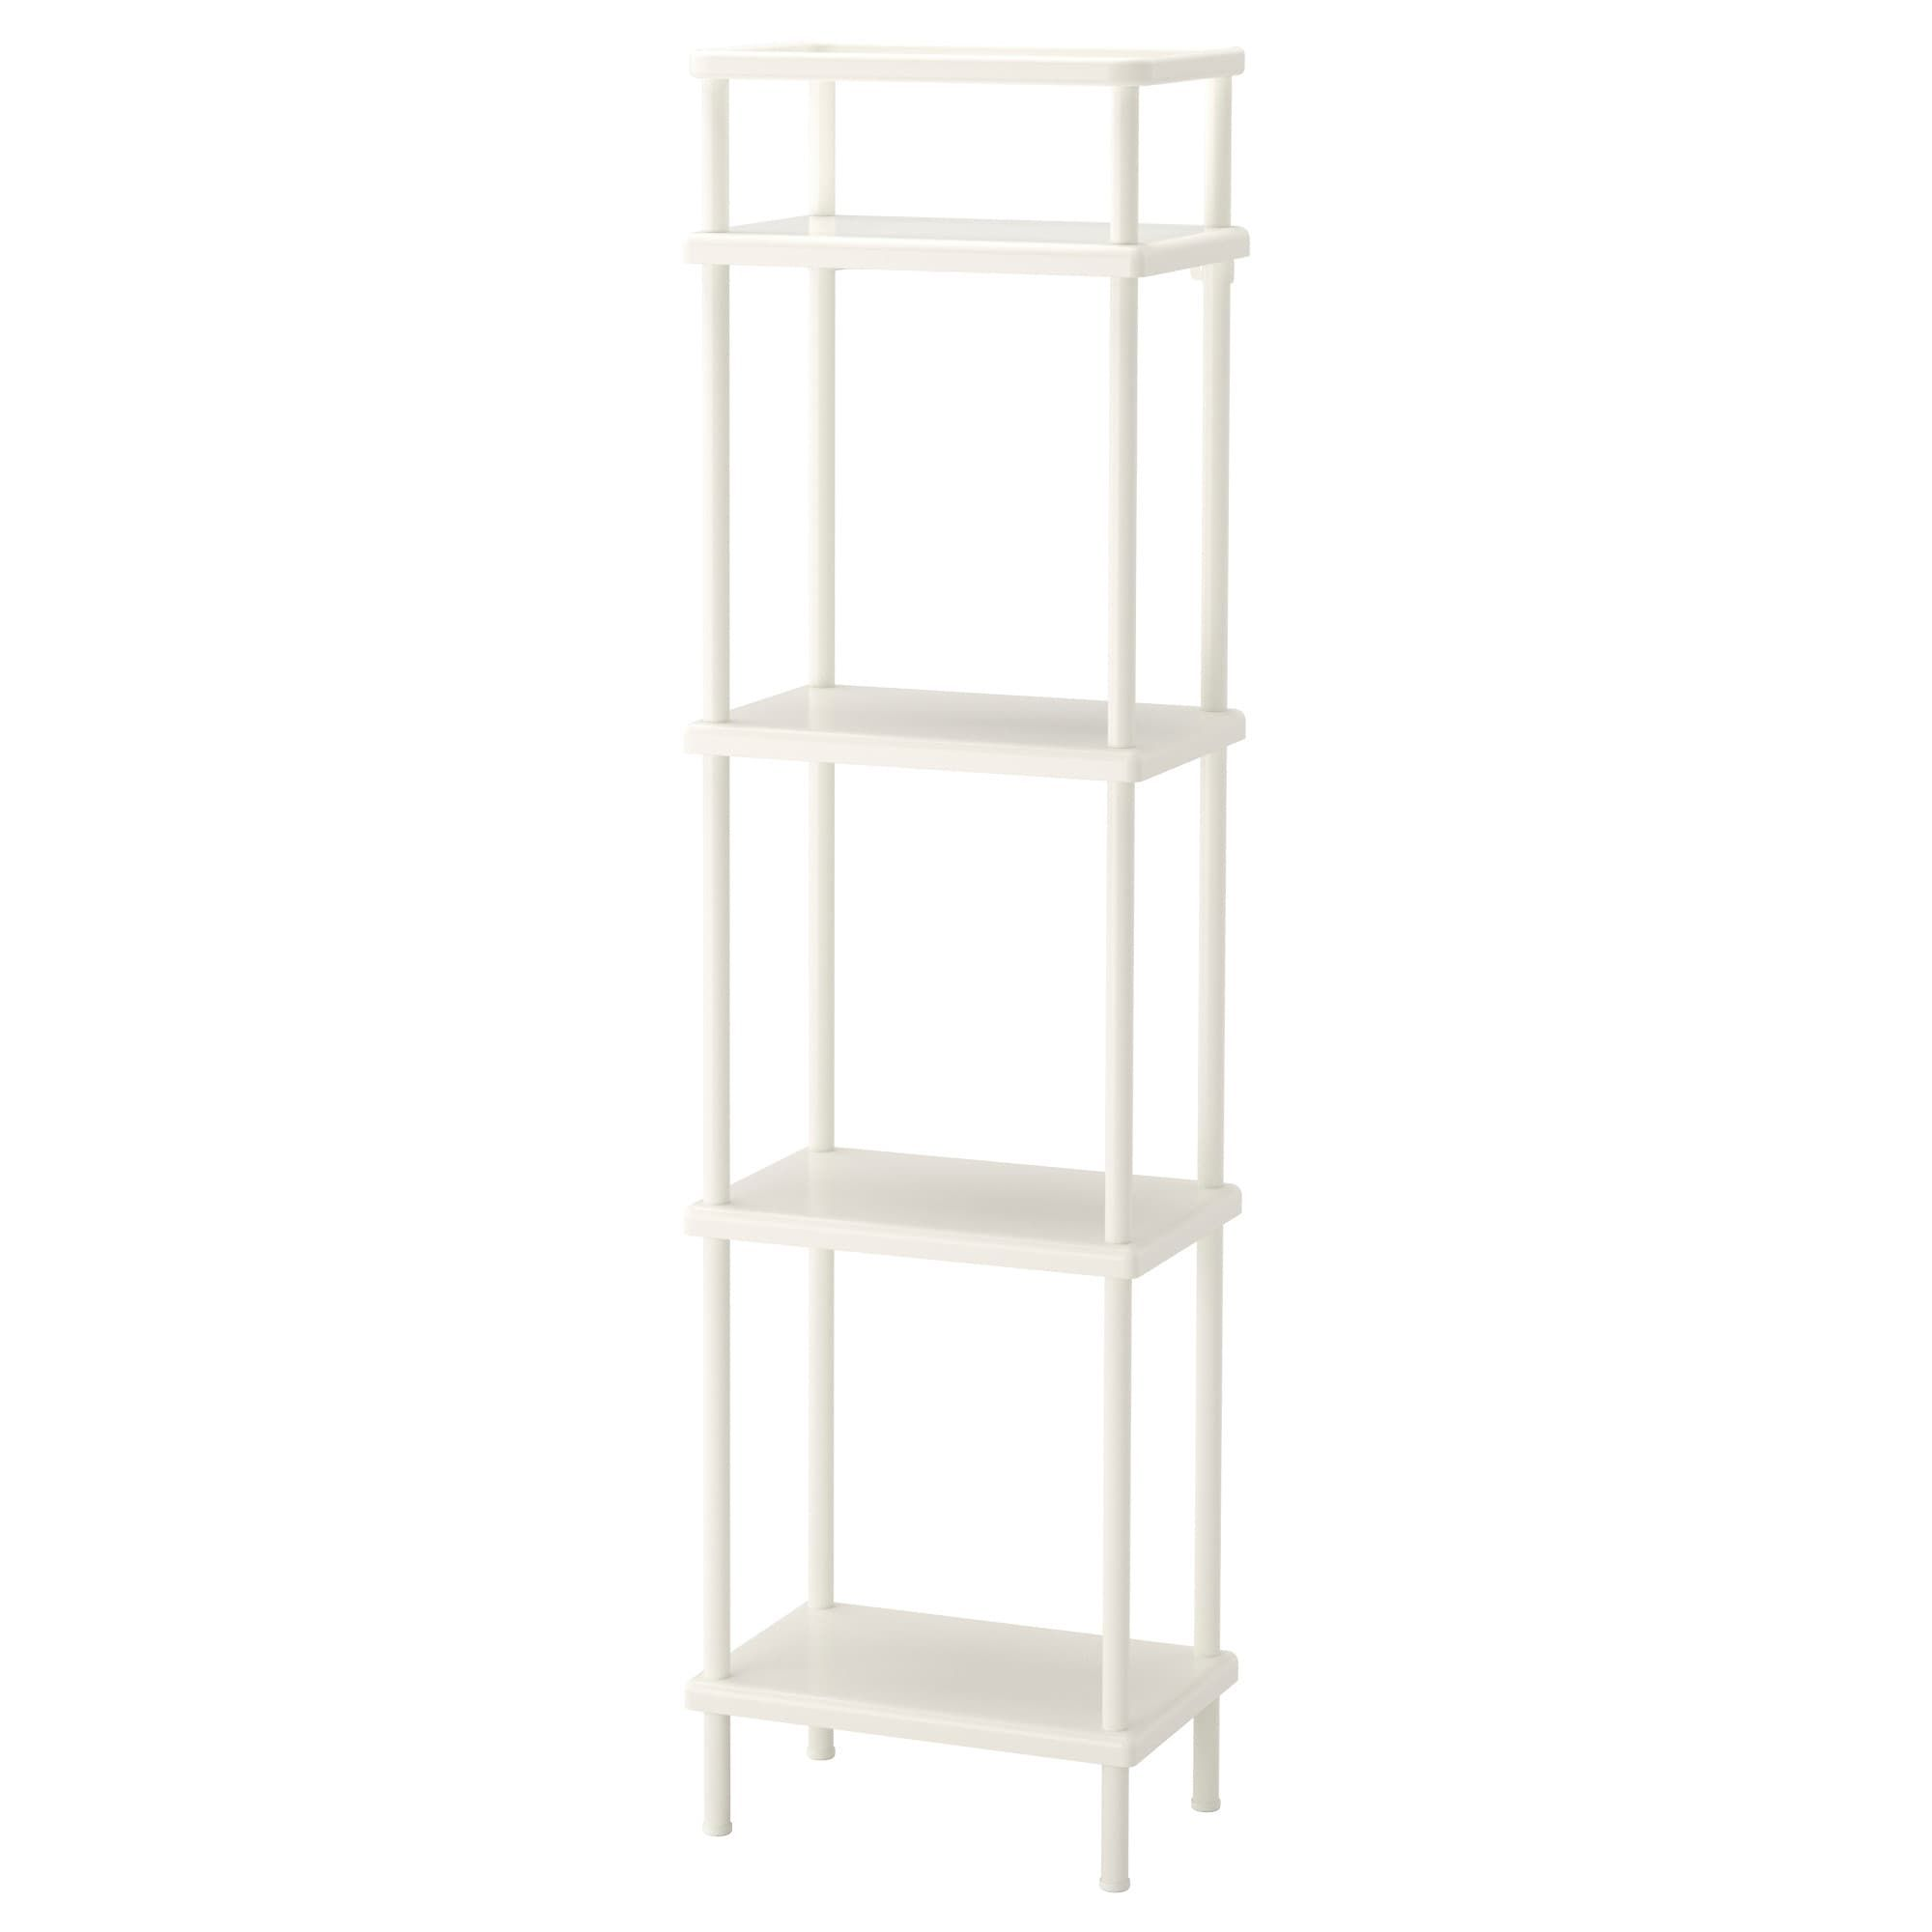 Dynan Shelf Unit White 15 3 4x10 5 8x58 1 4 Ikea Idees Etageres Ikea Dynan Etageres Ouvertes